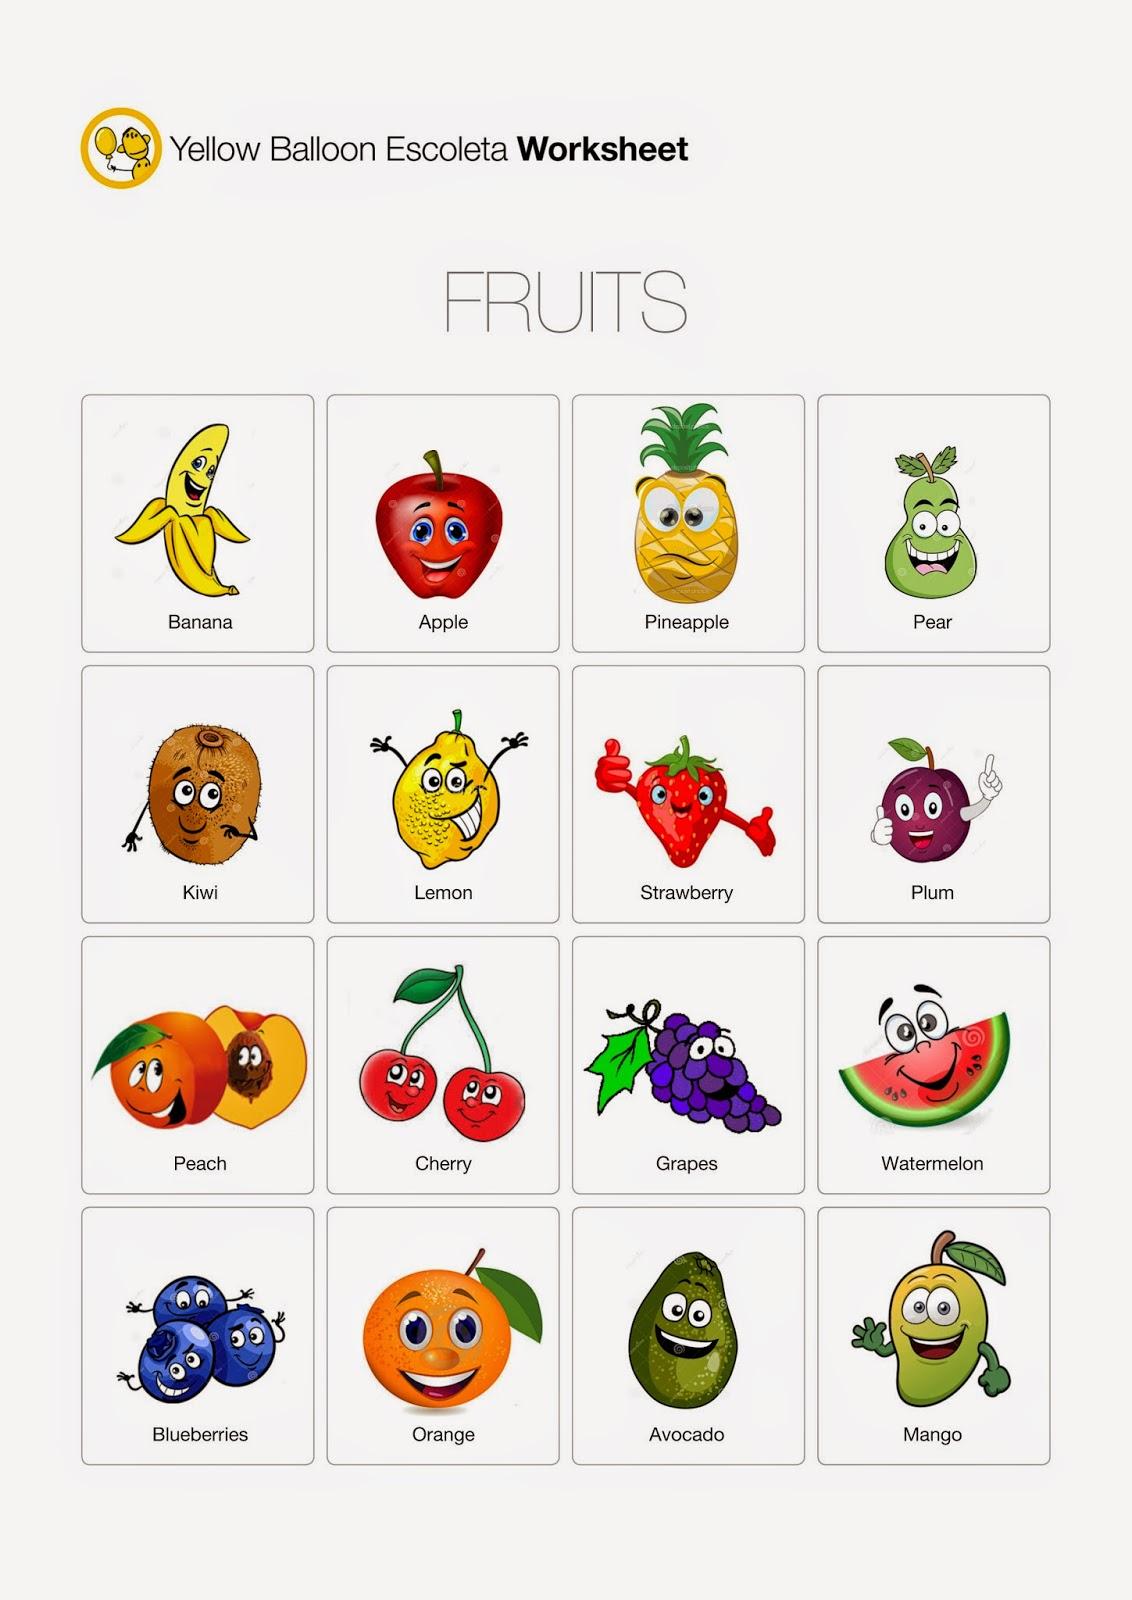 Yellow Balloon Escoleta Fruits Worksheet